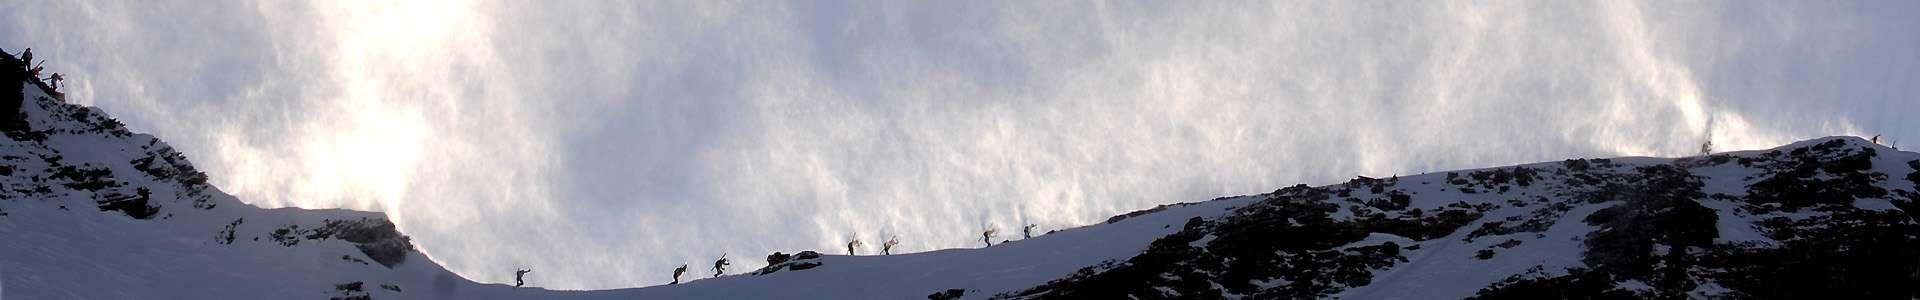 ski-rando3-142